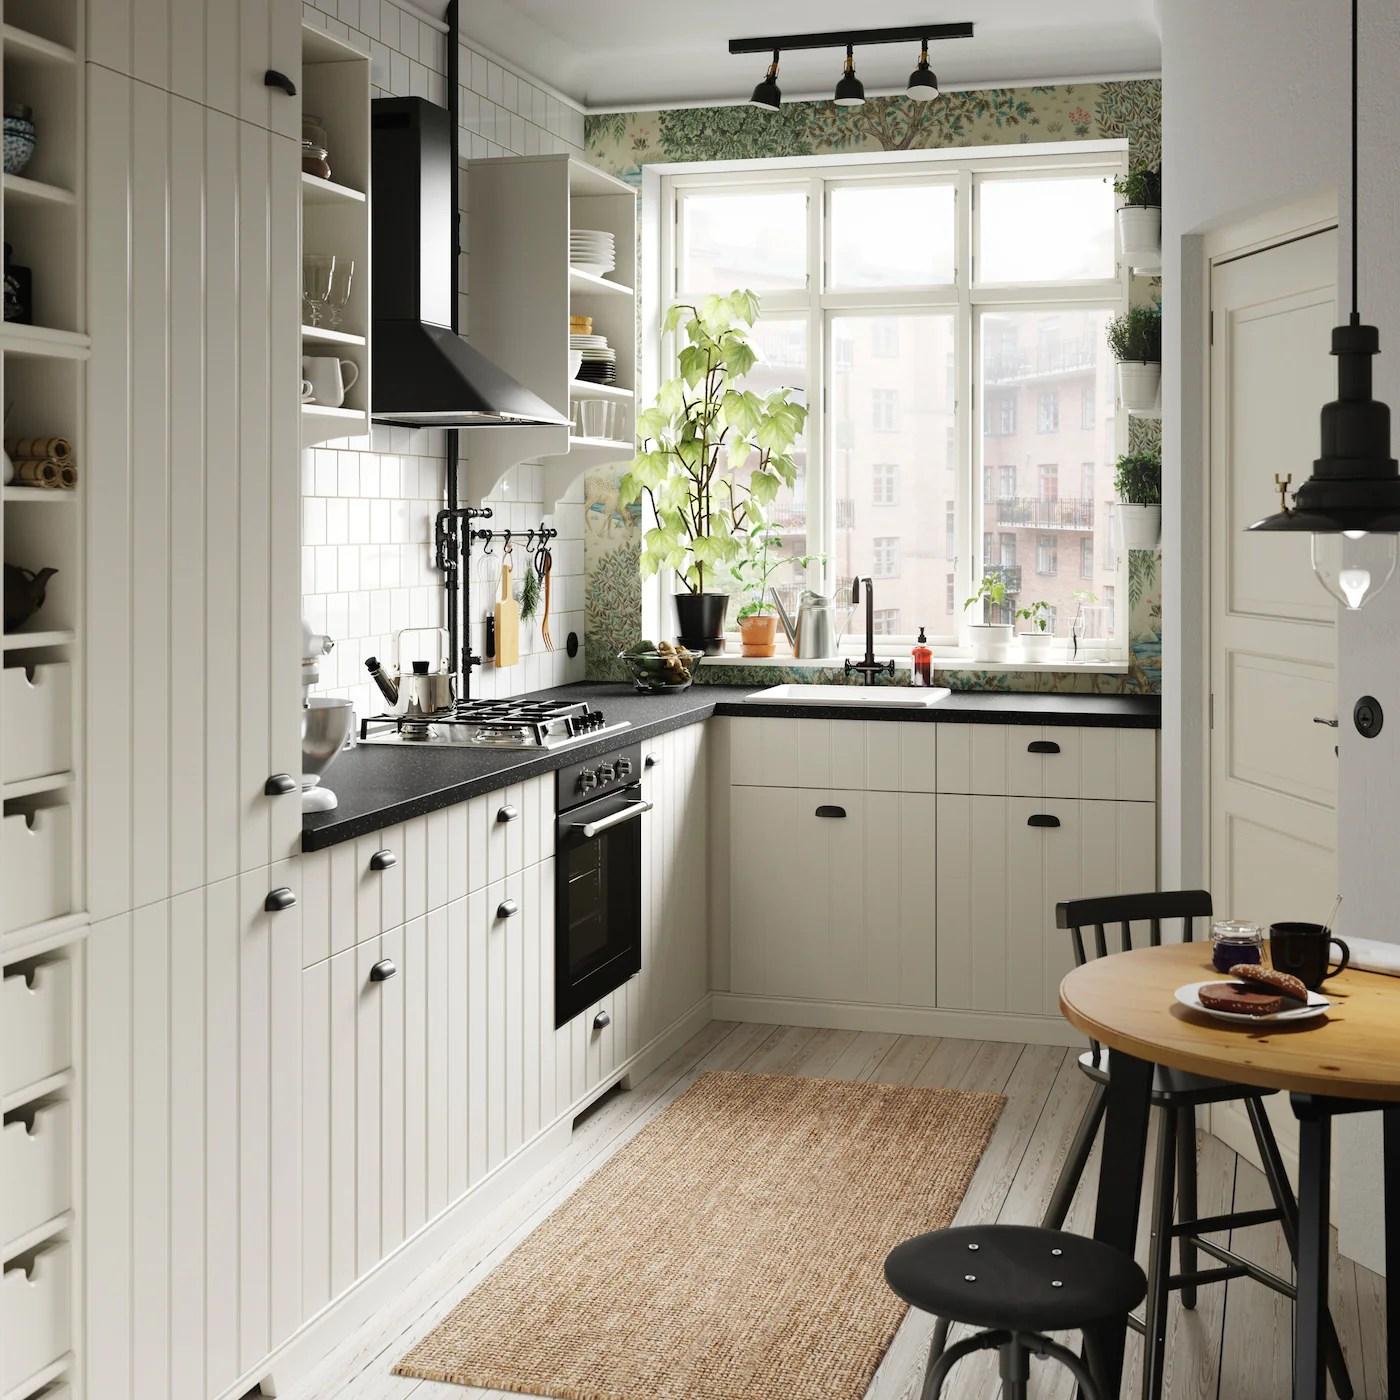 Küche & Kochbereich Ideen & Inspirationen   IKEA Deutschland